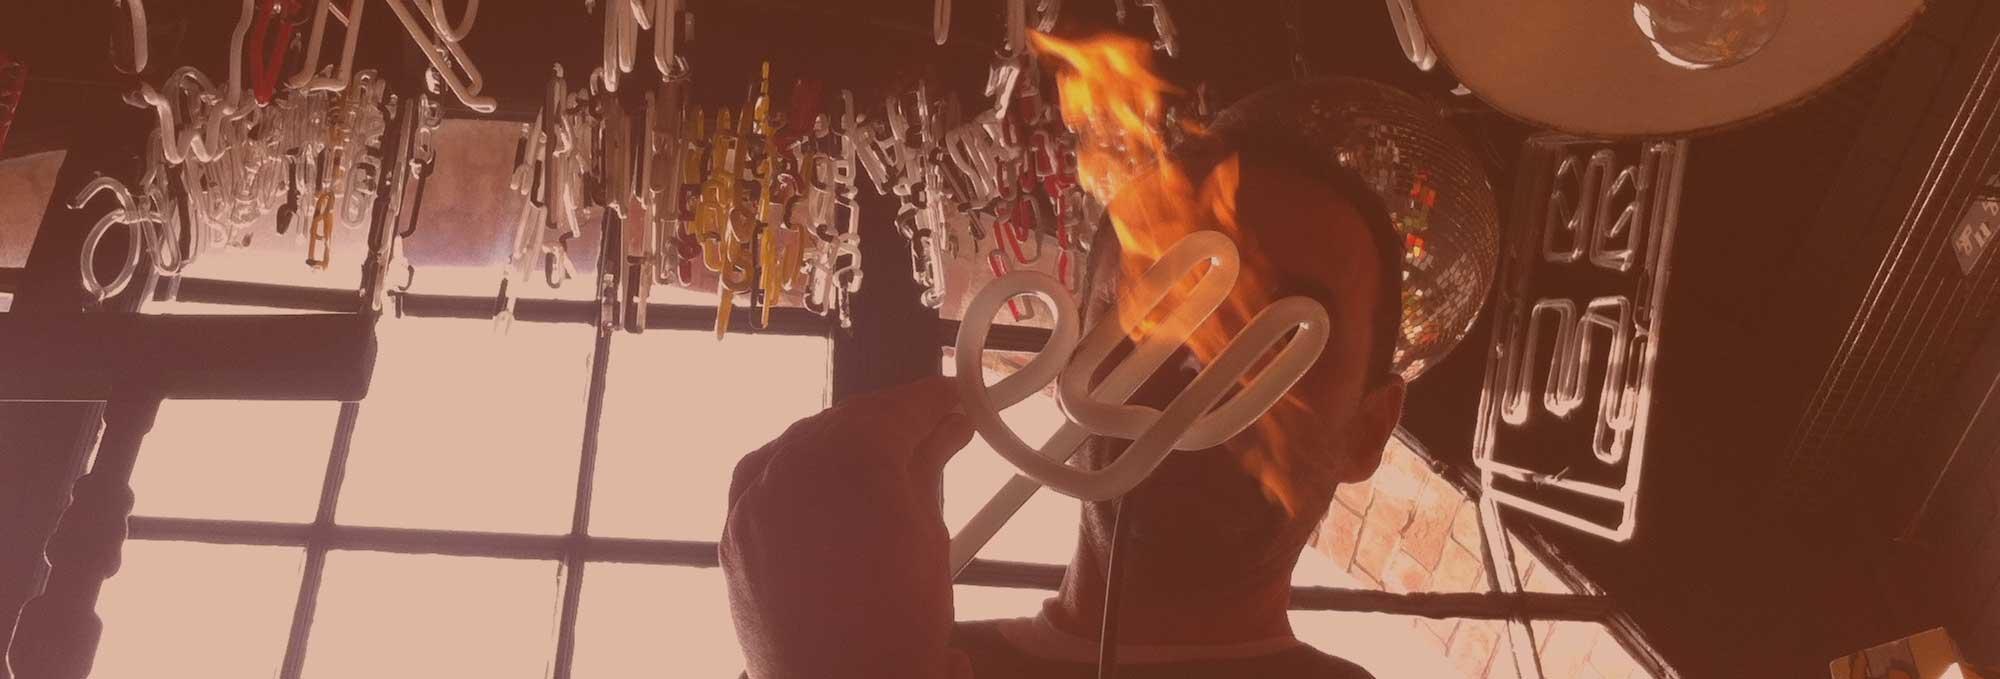 Andy Doig, Neon Artist